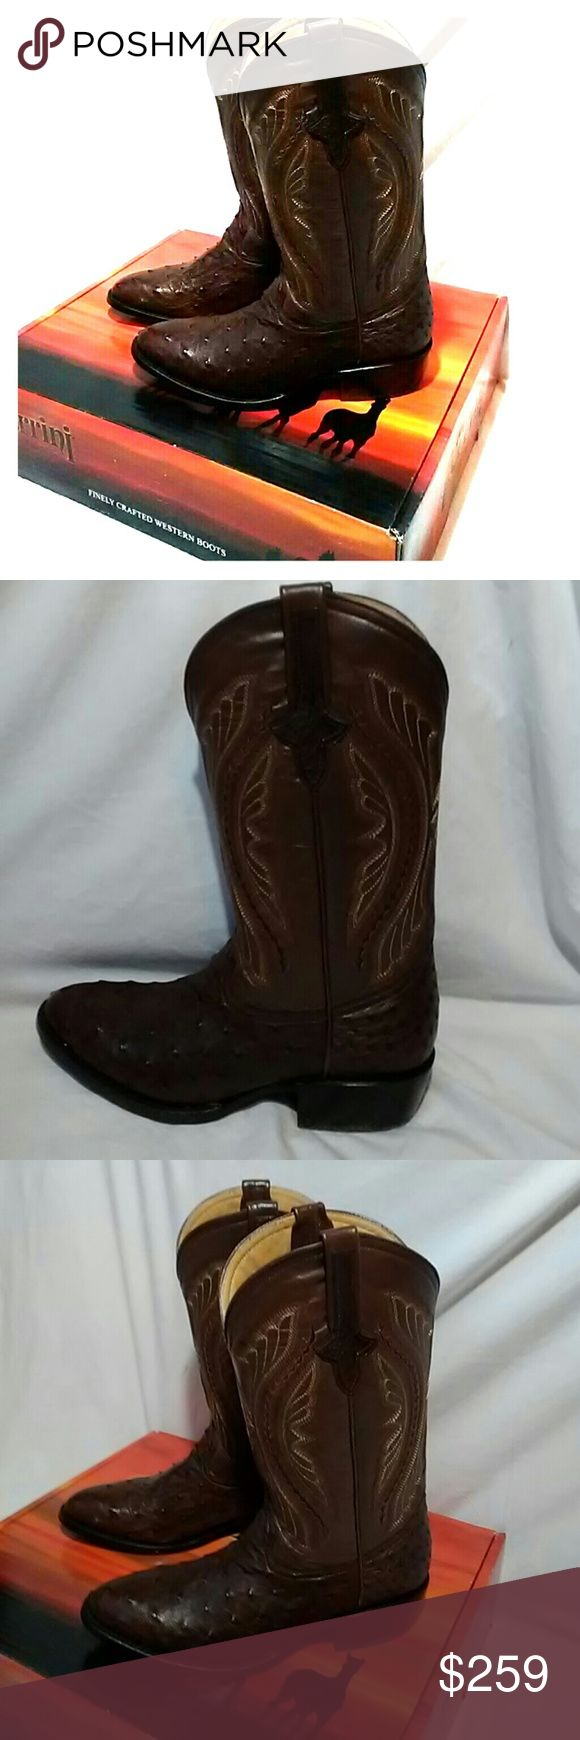 NIB Men's Ferrini OSTRICH western cowboy boots quality ostrich cowboy boots by Ferrini....BRAND NEW with box. Beautiful chocolate brown ostrich and upper is also chocolate brown! Ferrini Shoes Cowboy & Western Boots